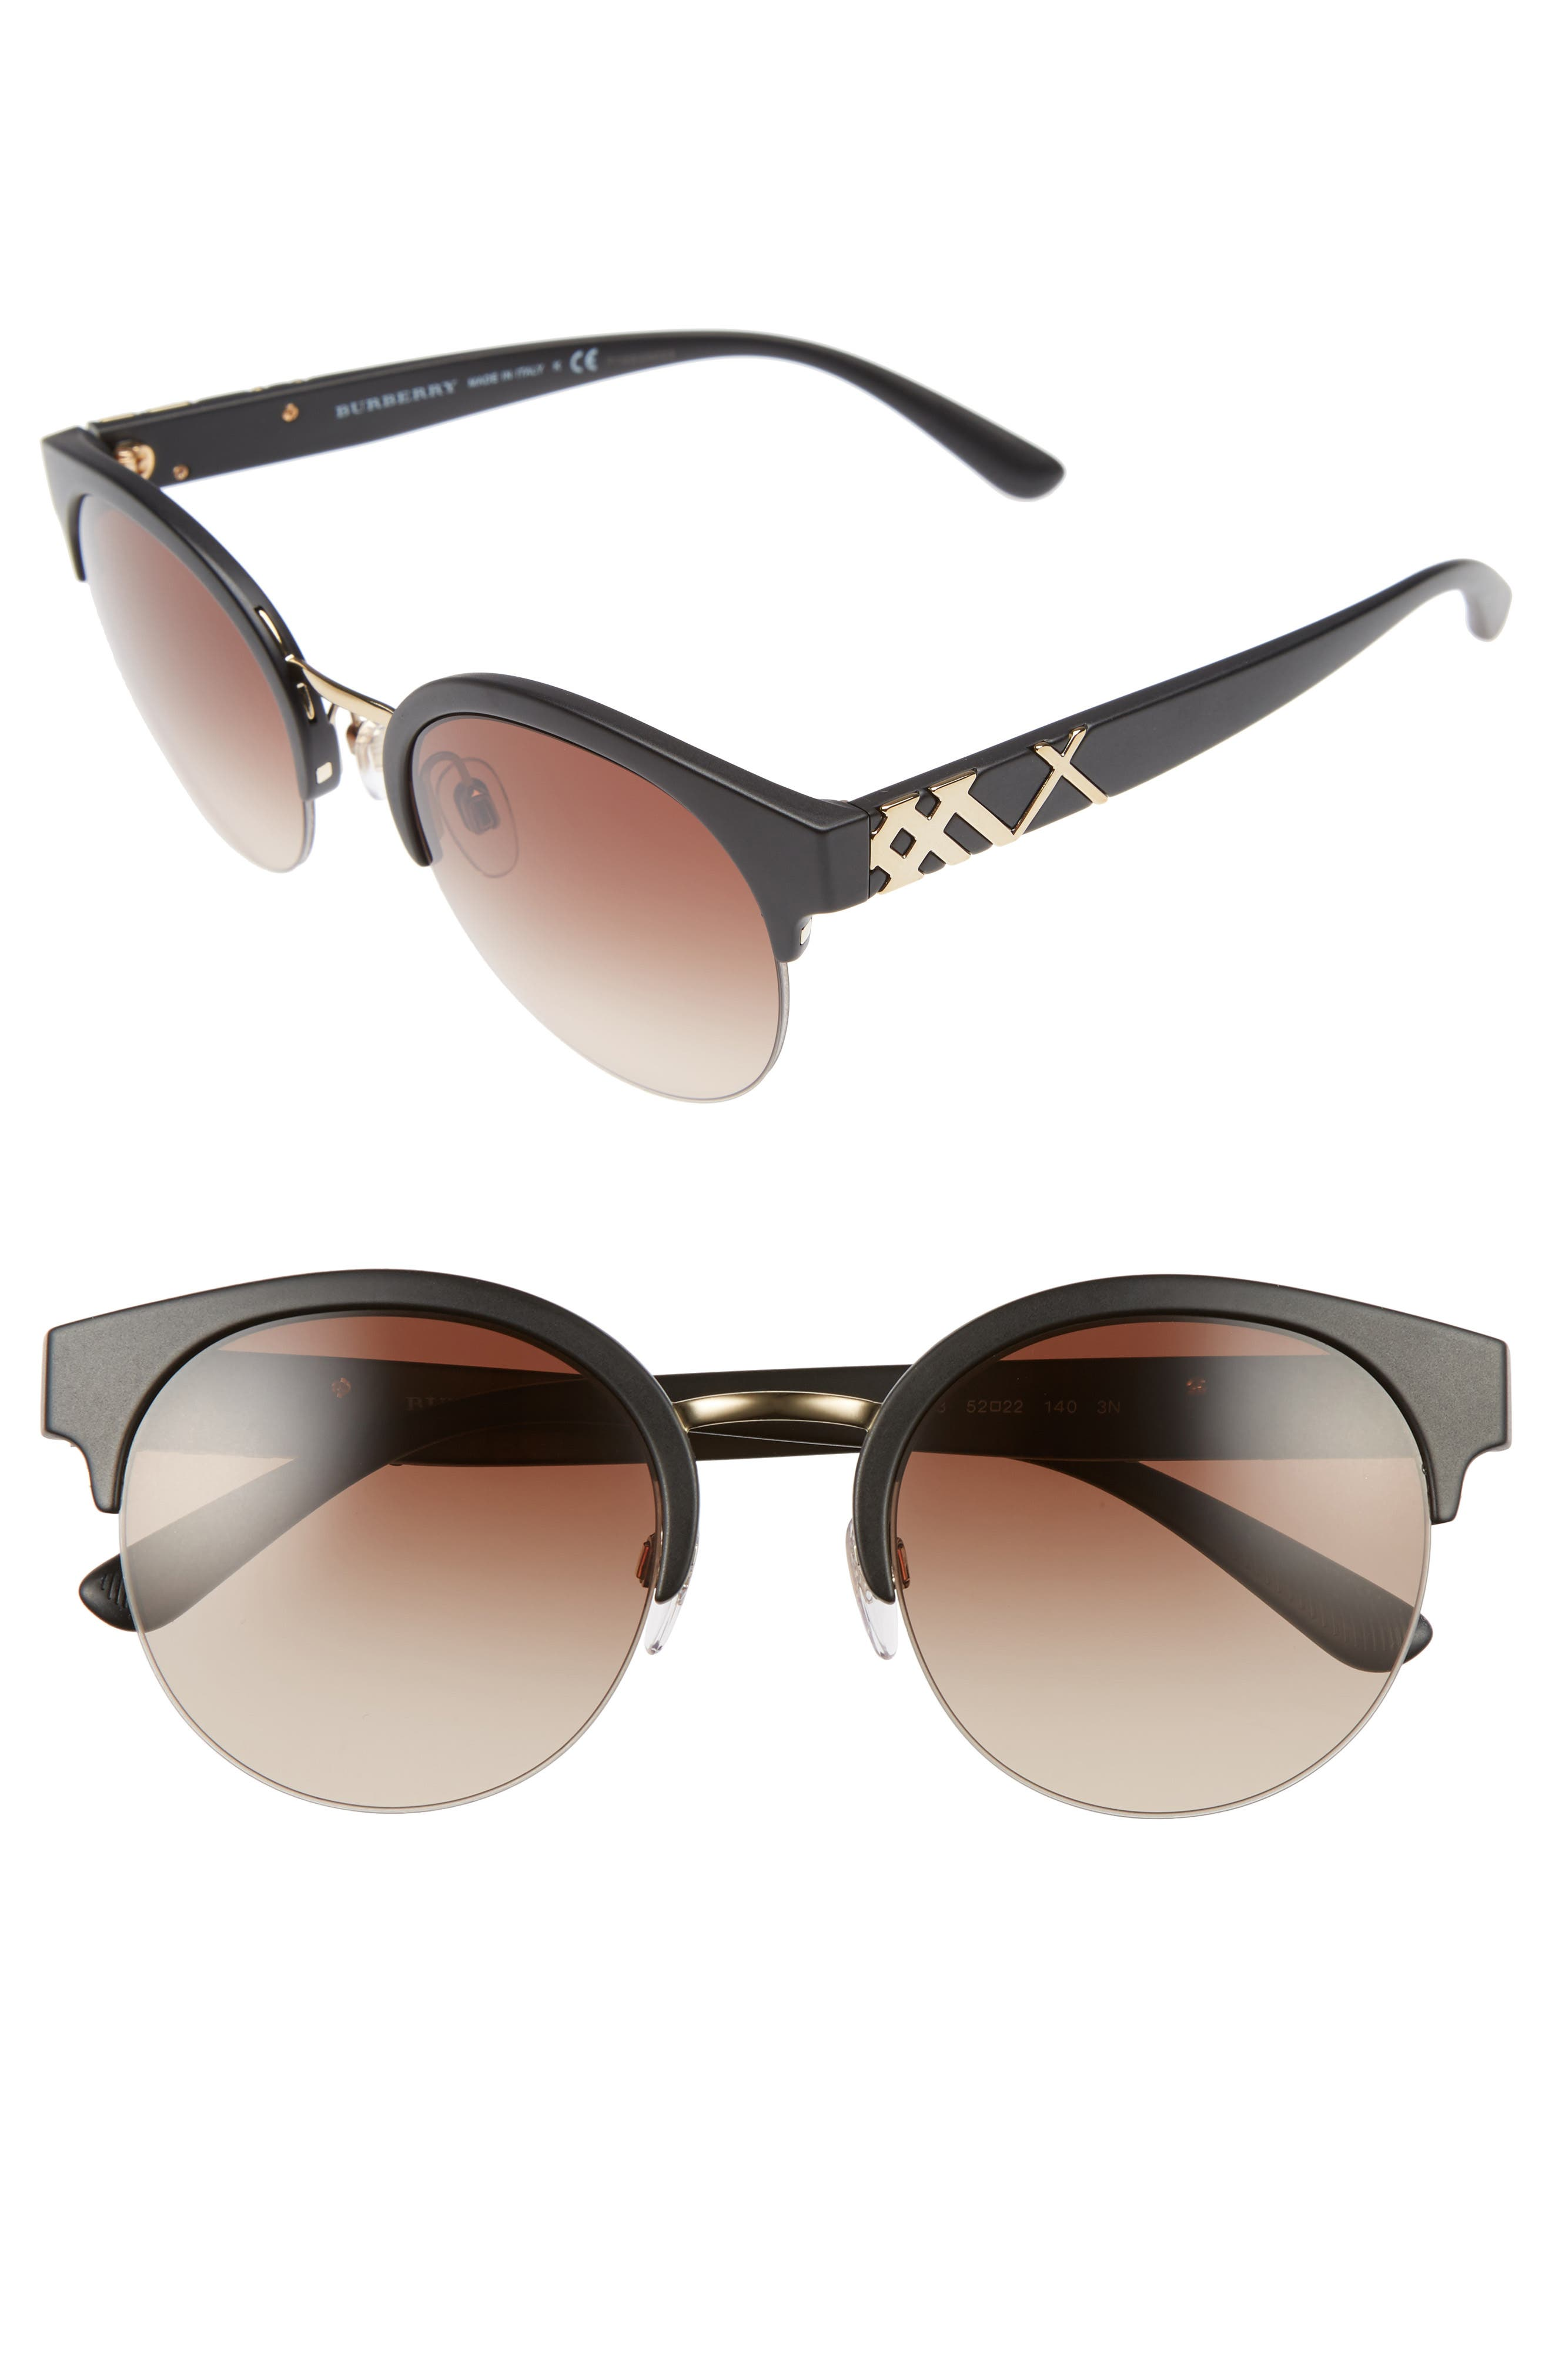 52mm Gradient Semi Rimless Sunglasses,                         Main,                         color,